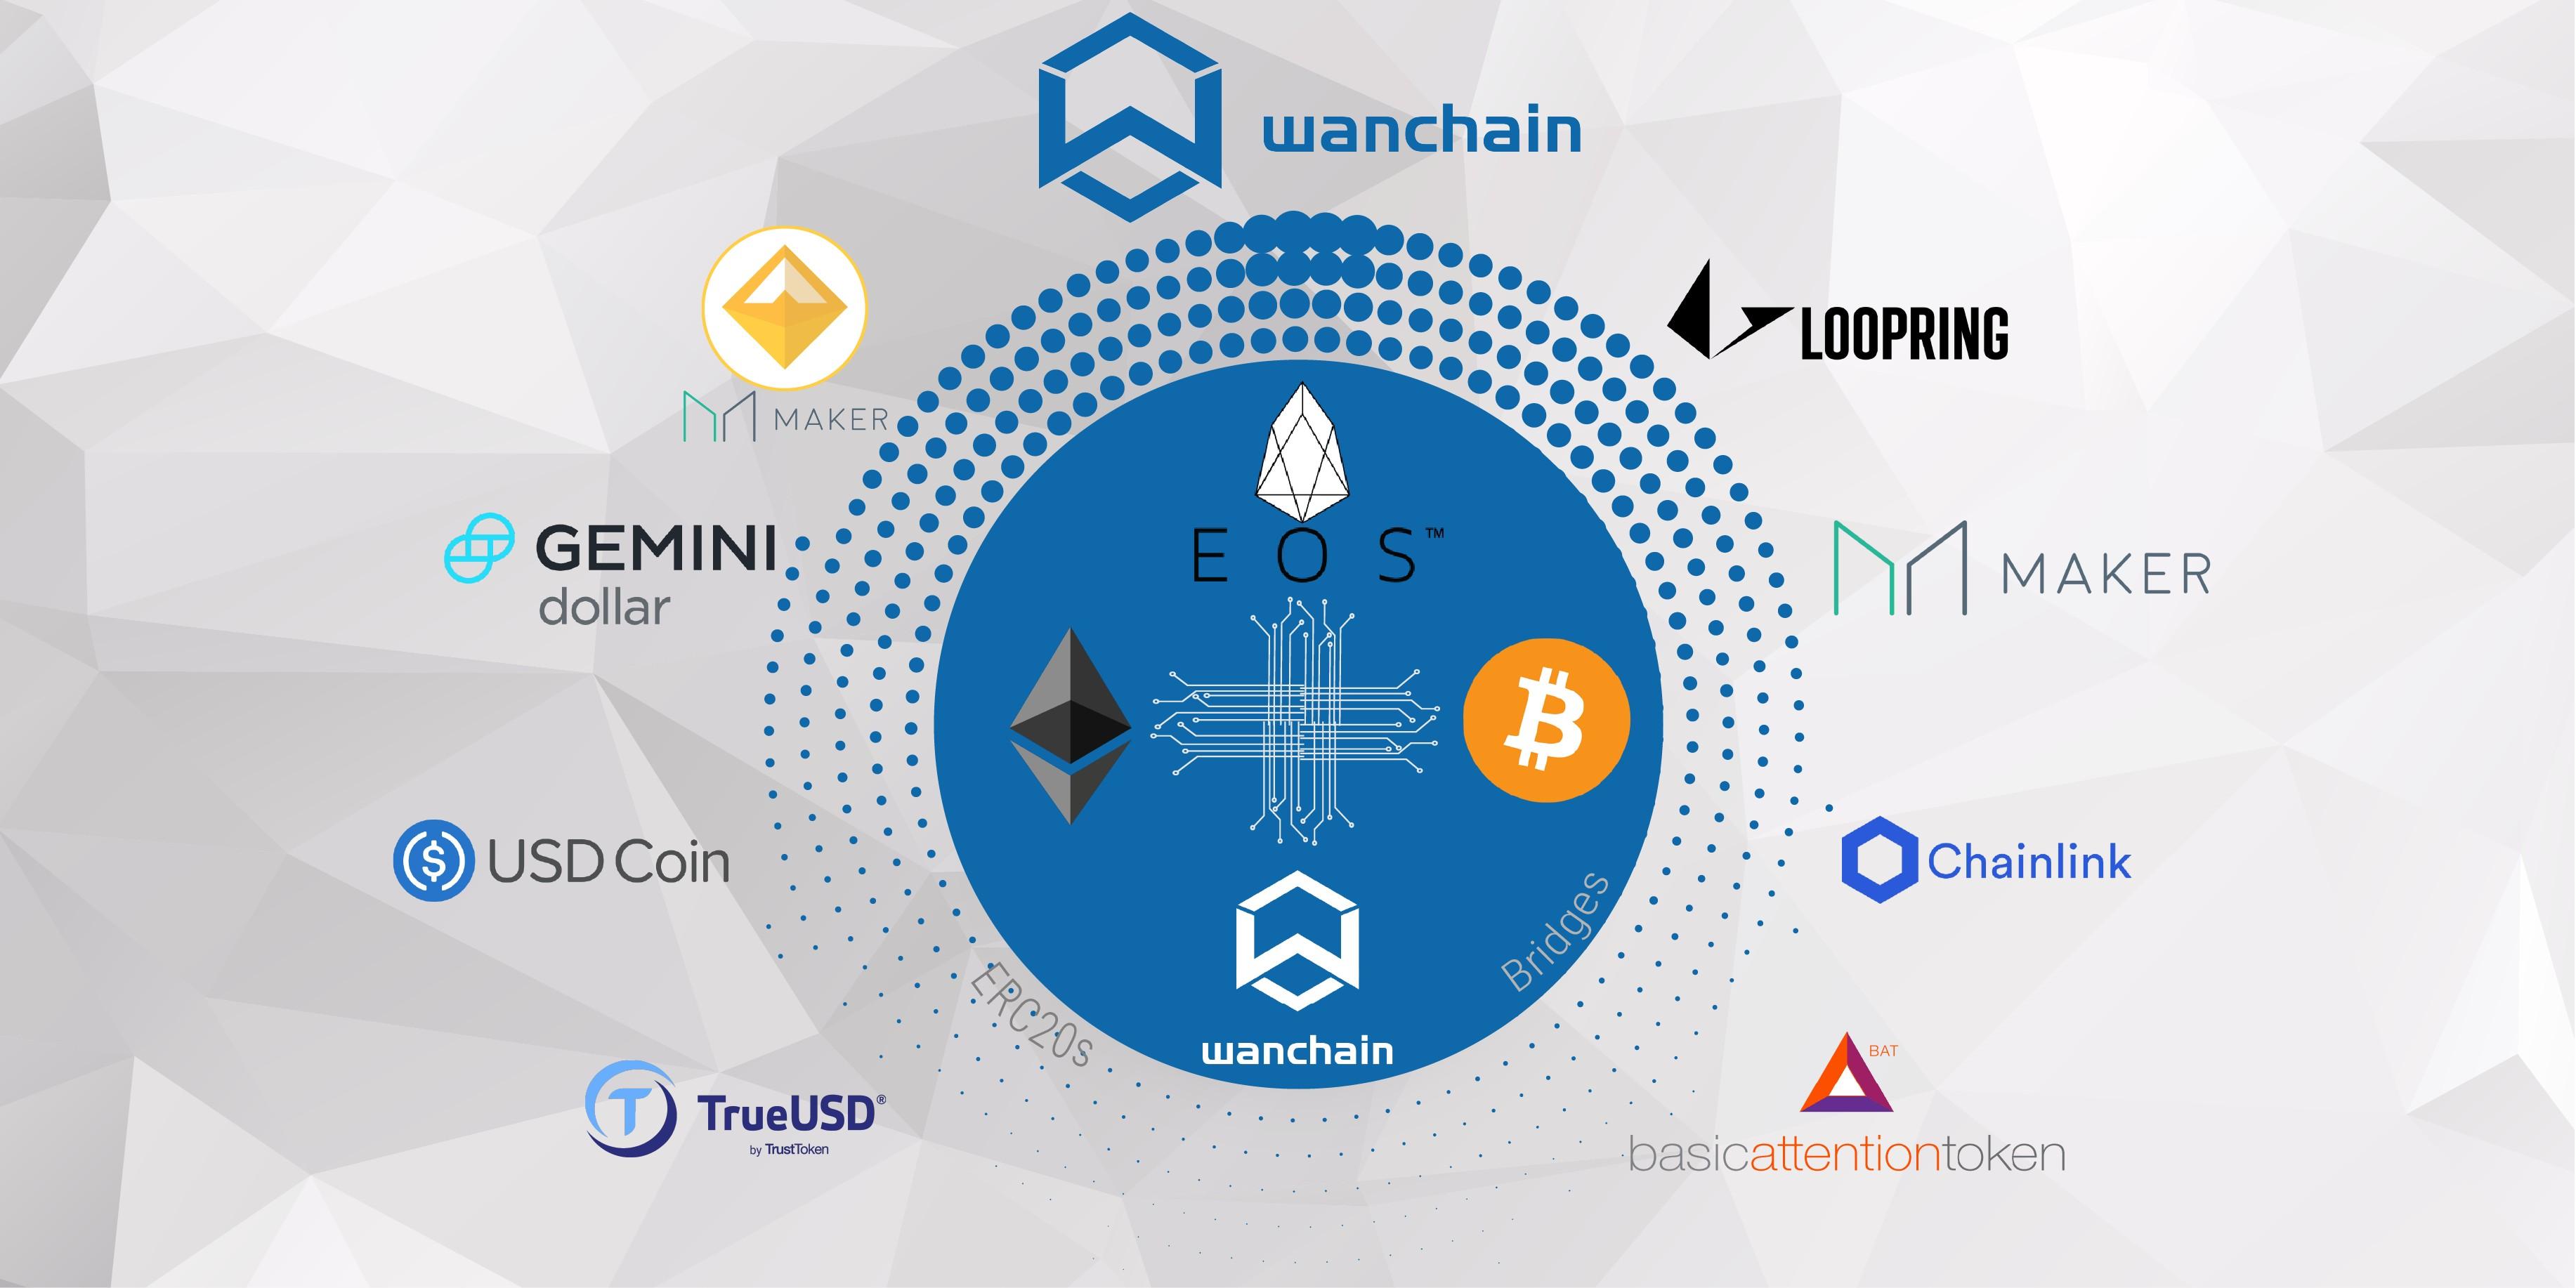 Wanchain将实现与EOS的跨链并集成更多的稳定币